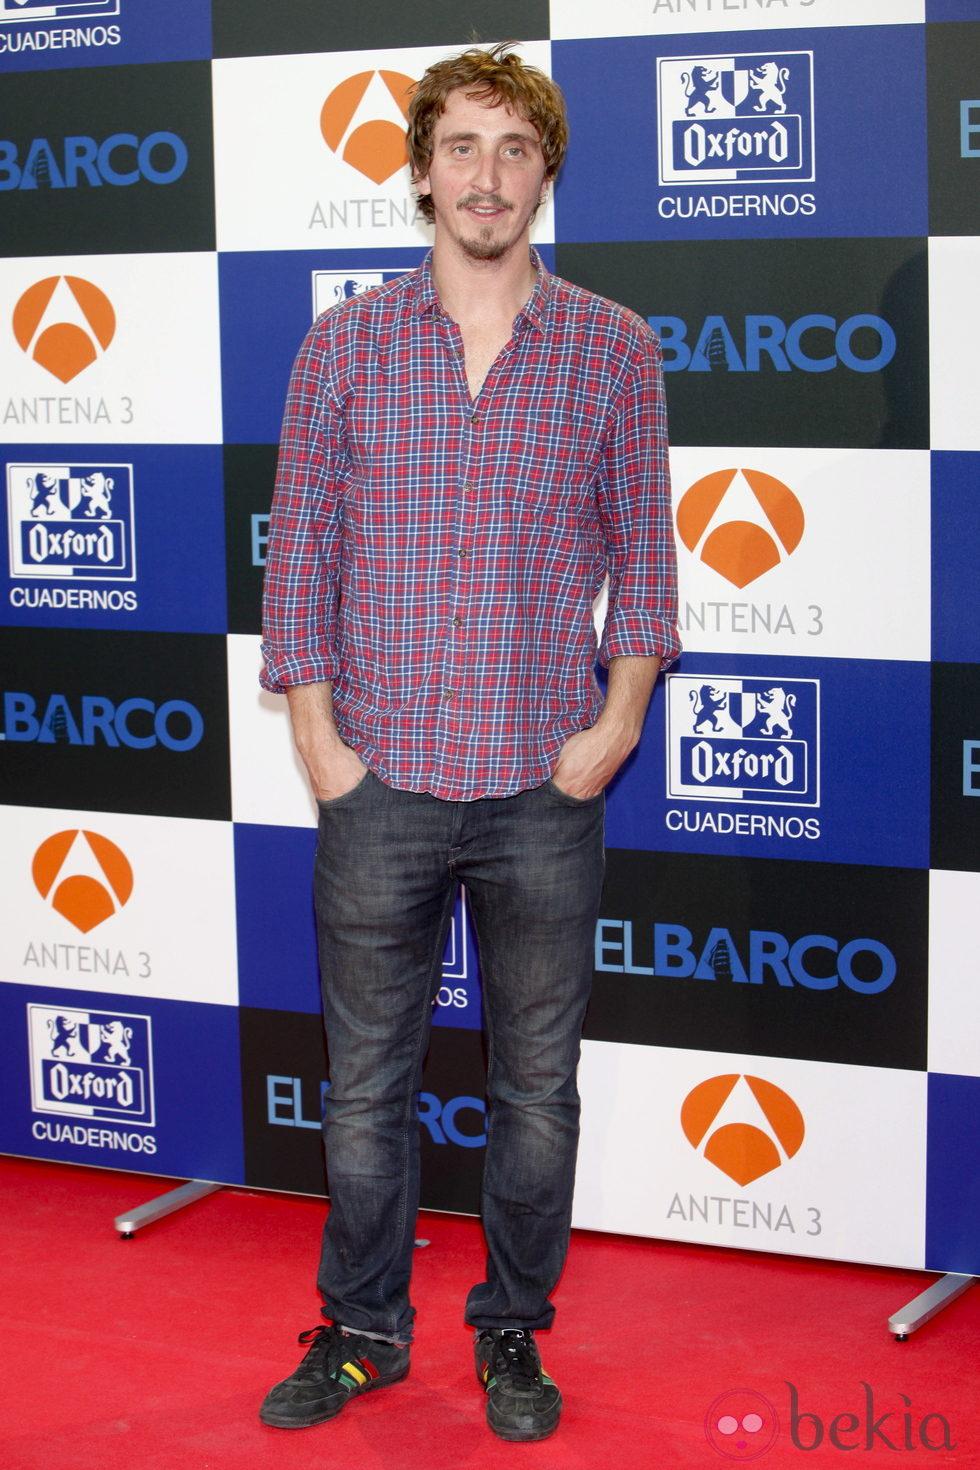 Iván Massague en el estreno de la segunda temporada de 'El barco'